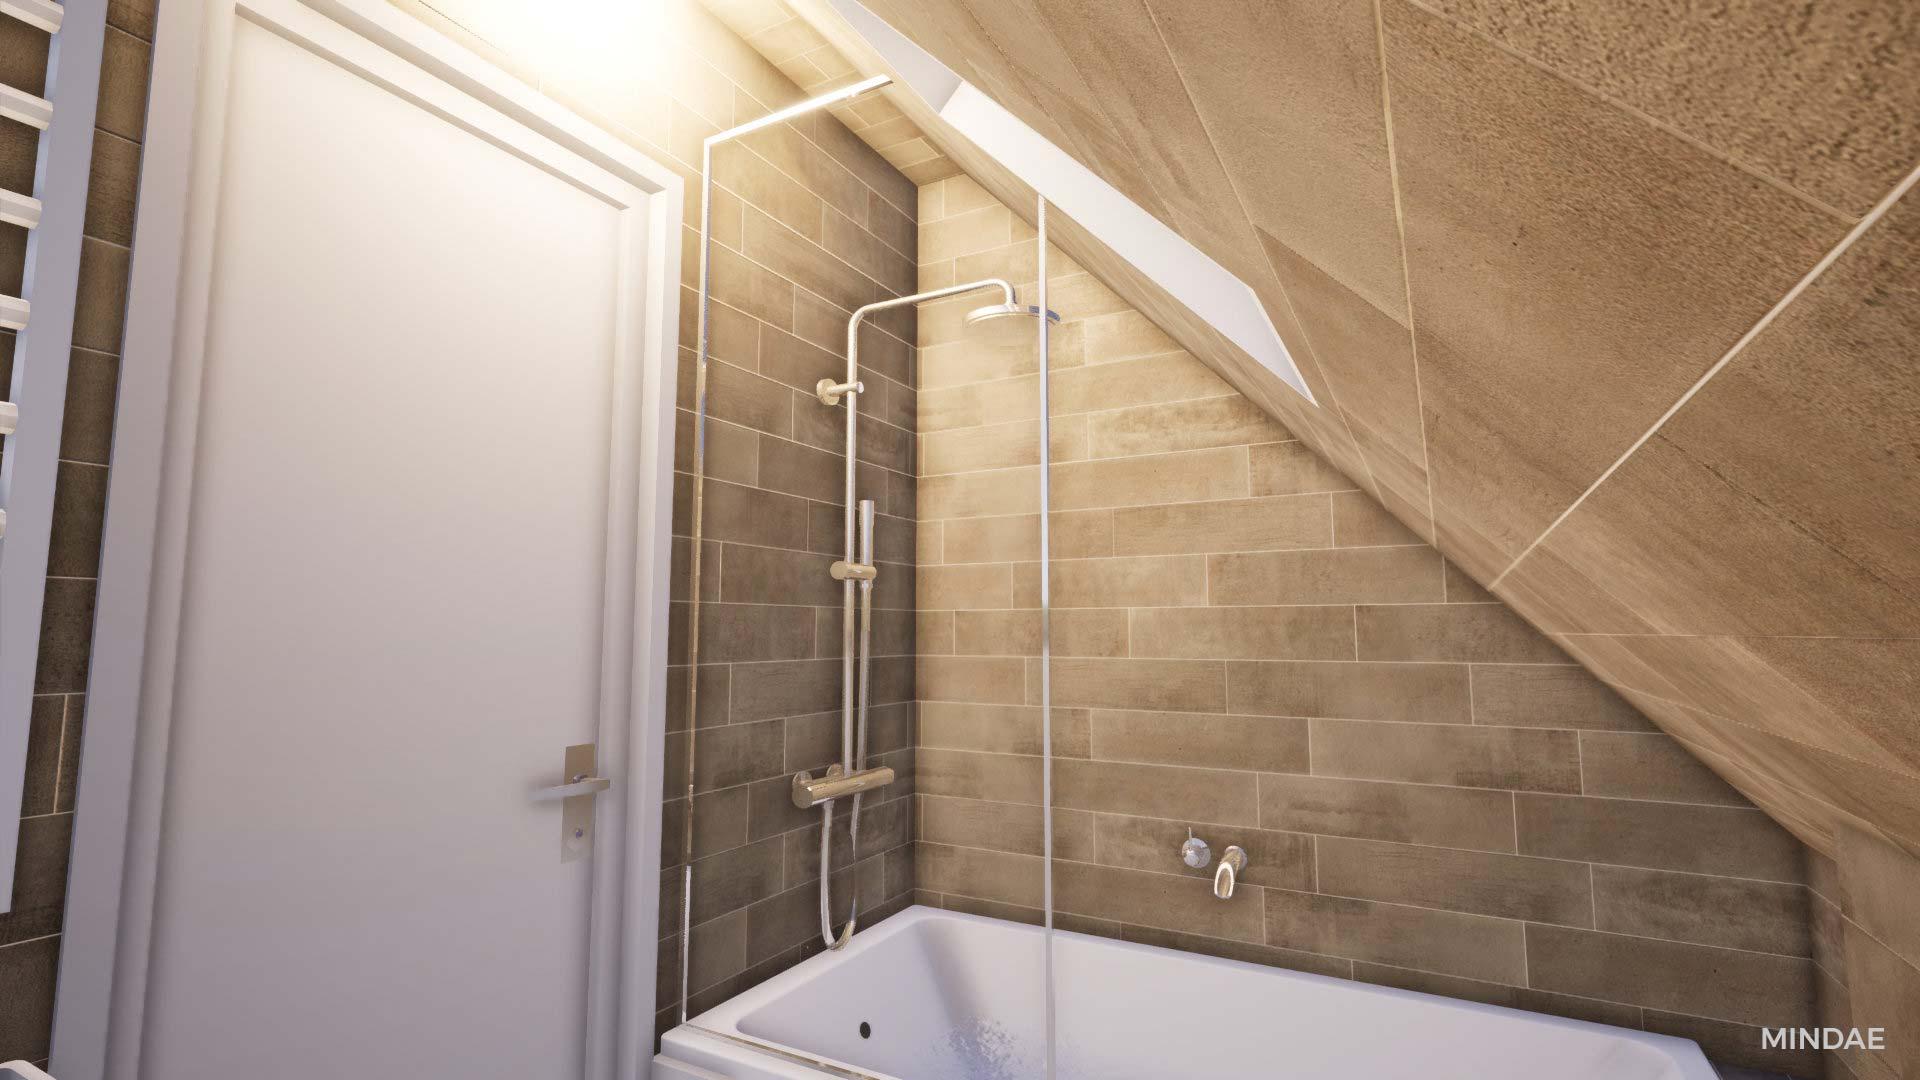 Mindae_3D_SDB_salle_de_bain_projet_renovation_2G_plomberie_calvados-(2)